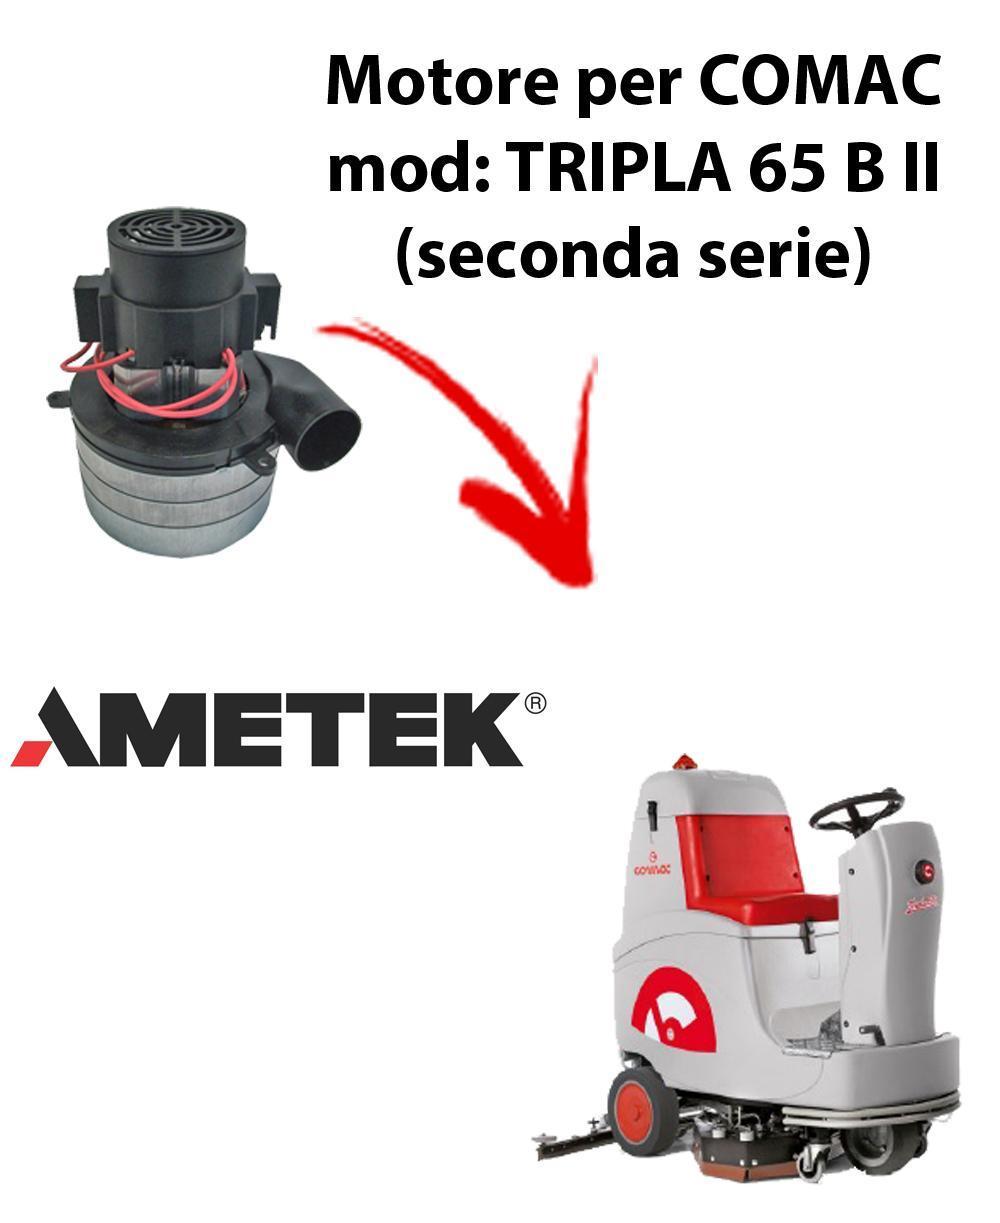 TRIPLA 65B II Motore de aspiración Ametek Italia  para fregadora Comac